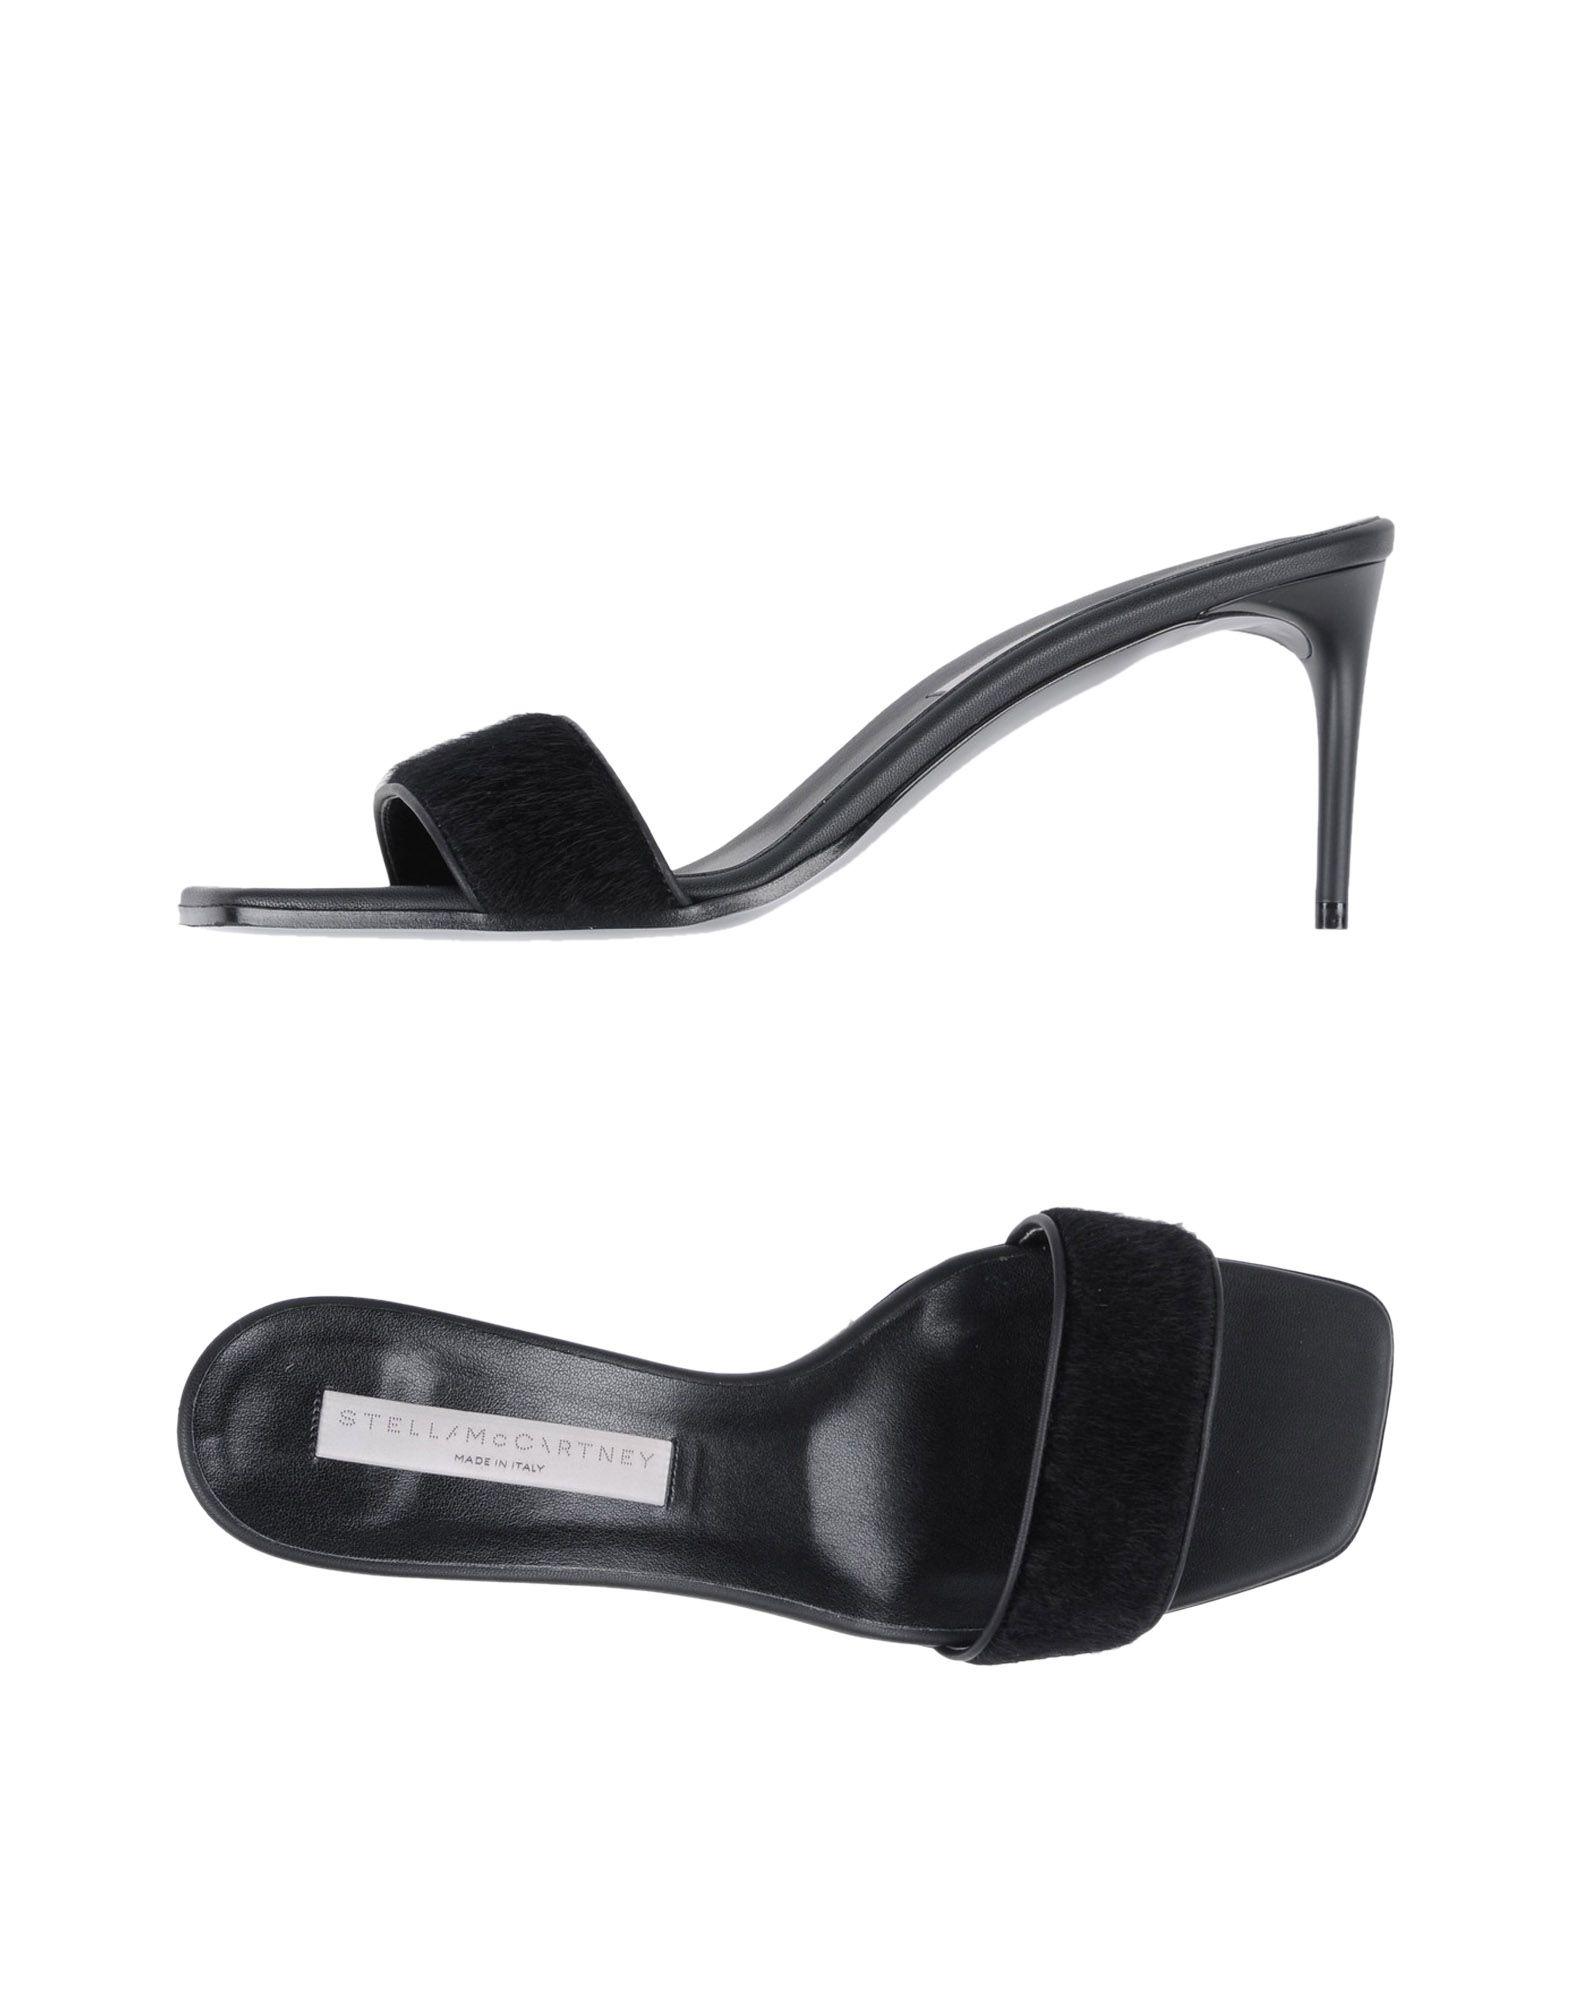 Stella Mccartney Sandalen Damen  11447746HKGut aussehende strapazierfähige Schuhe